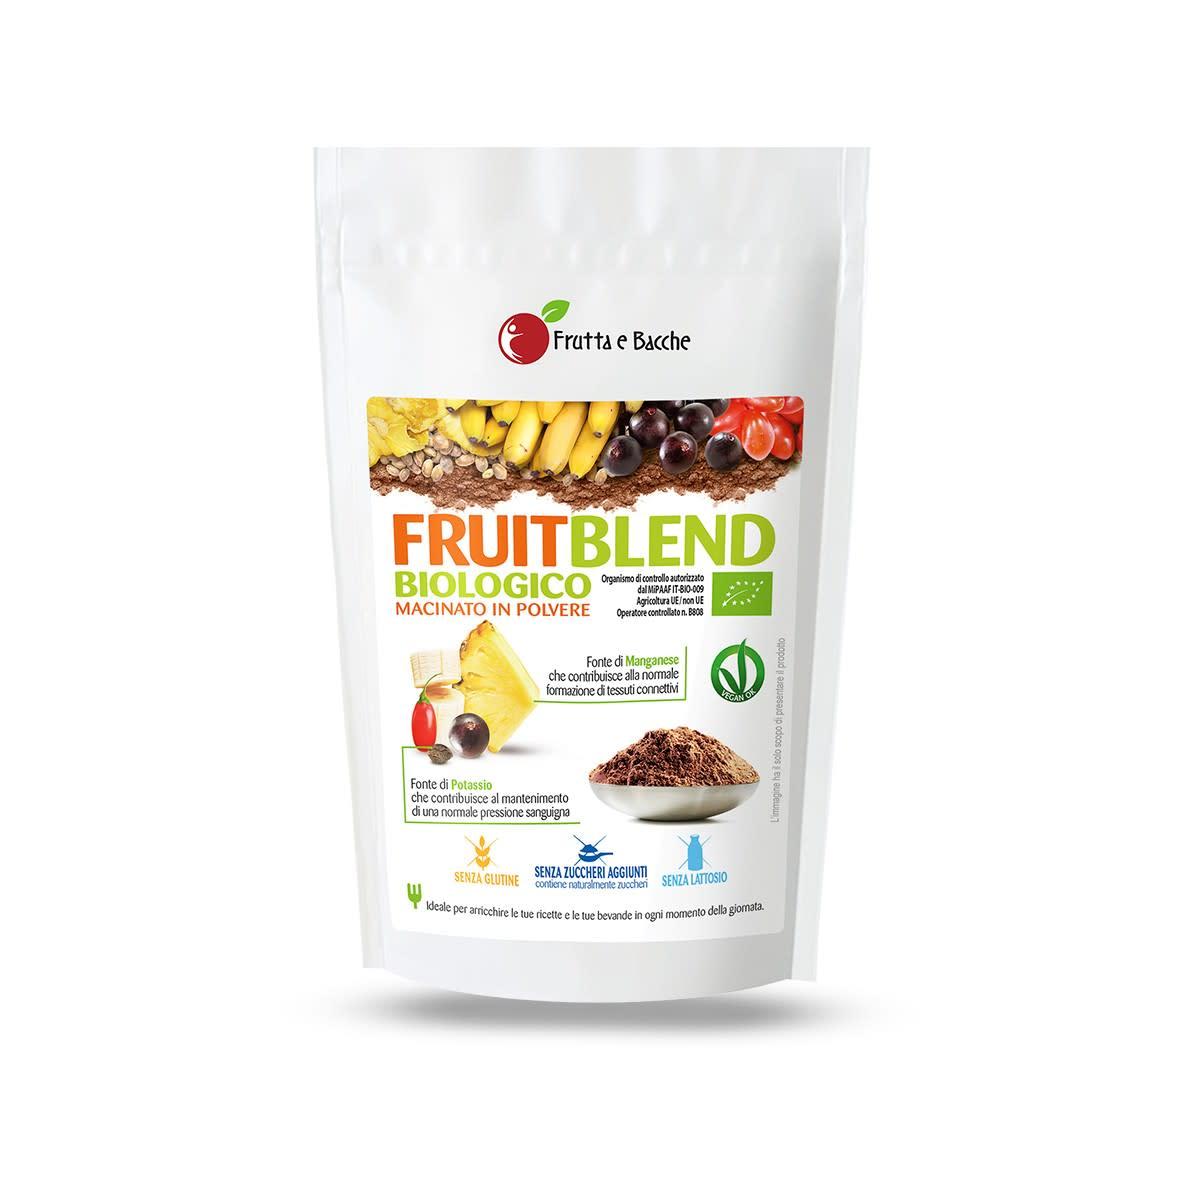 Frutta e Bacche Fruit Blend Mix Biologico